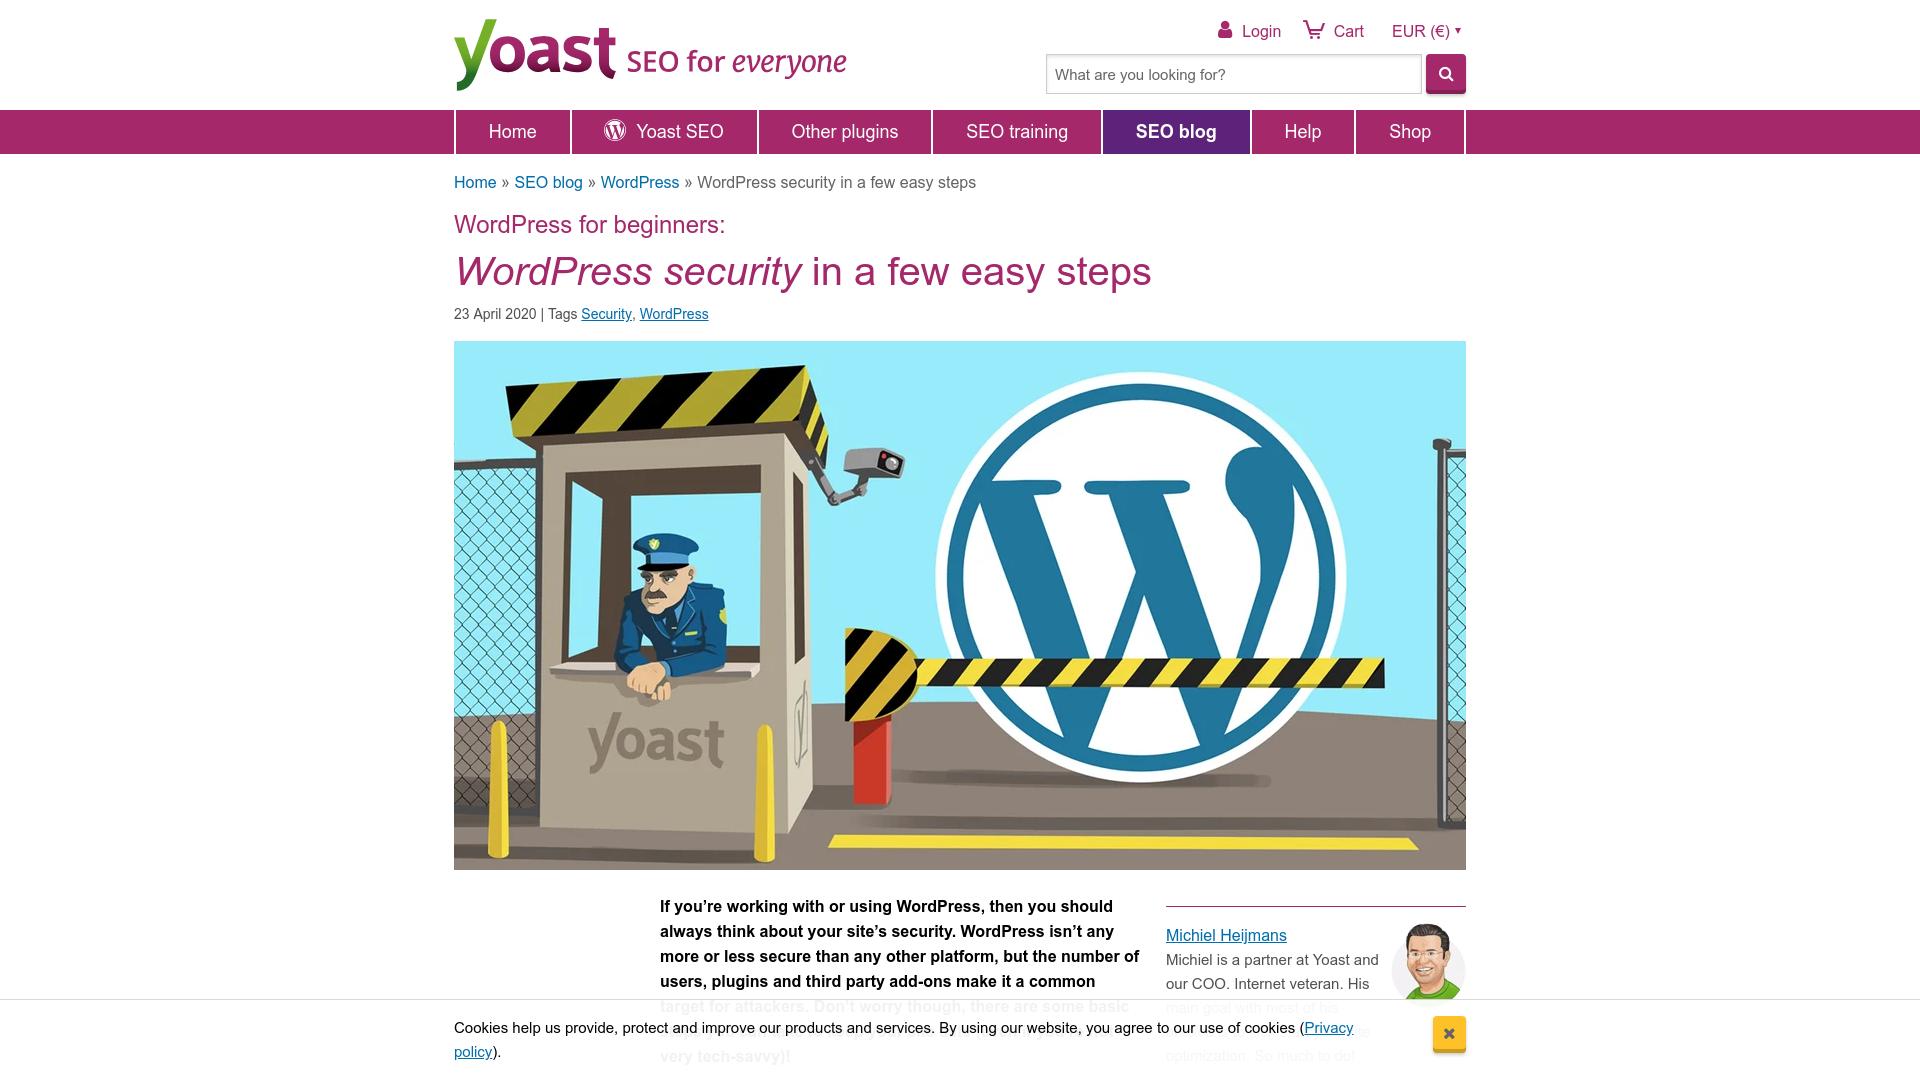 https://yoast.com/wordpress-security/